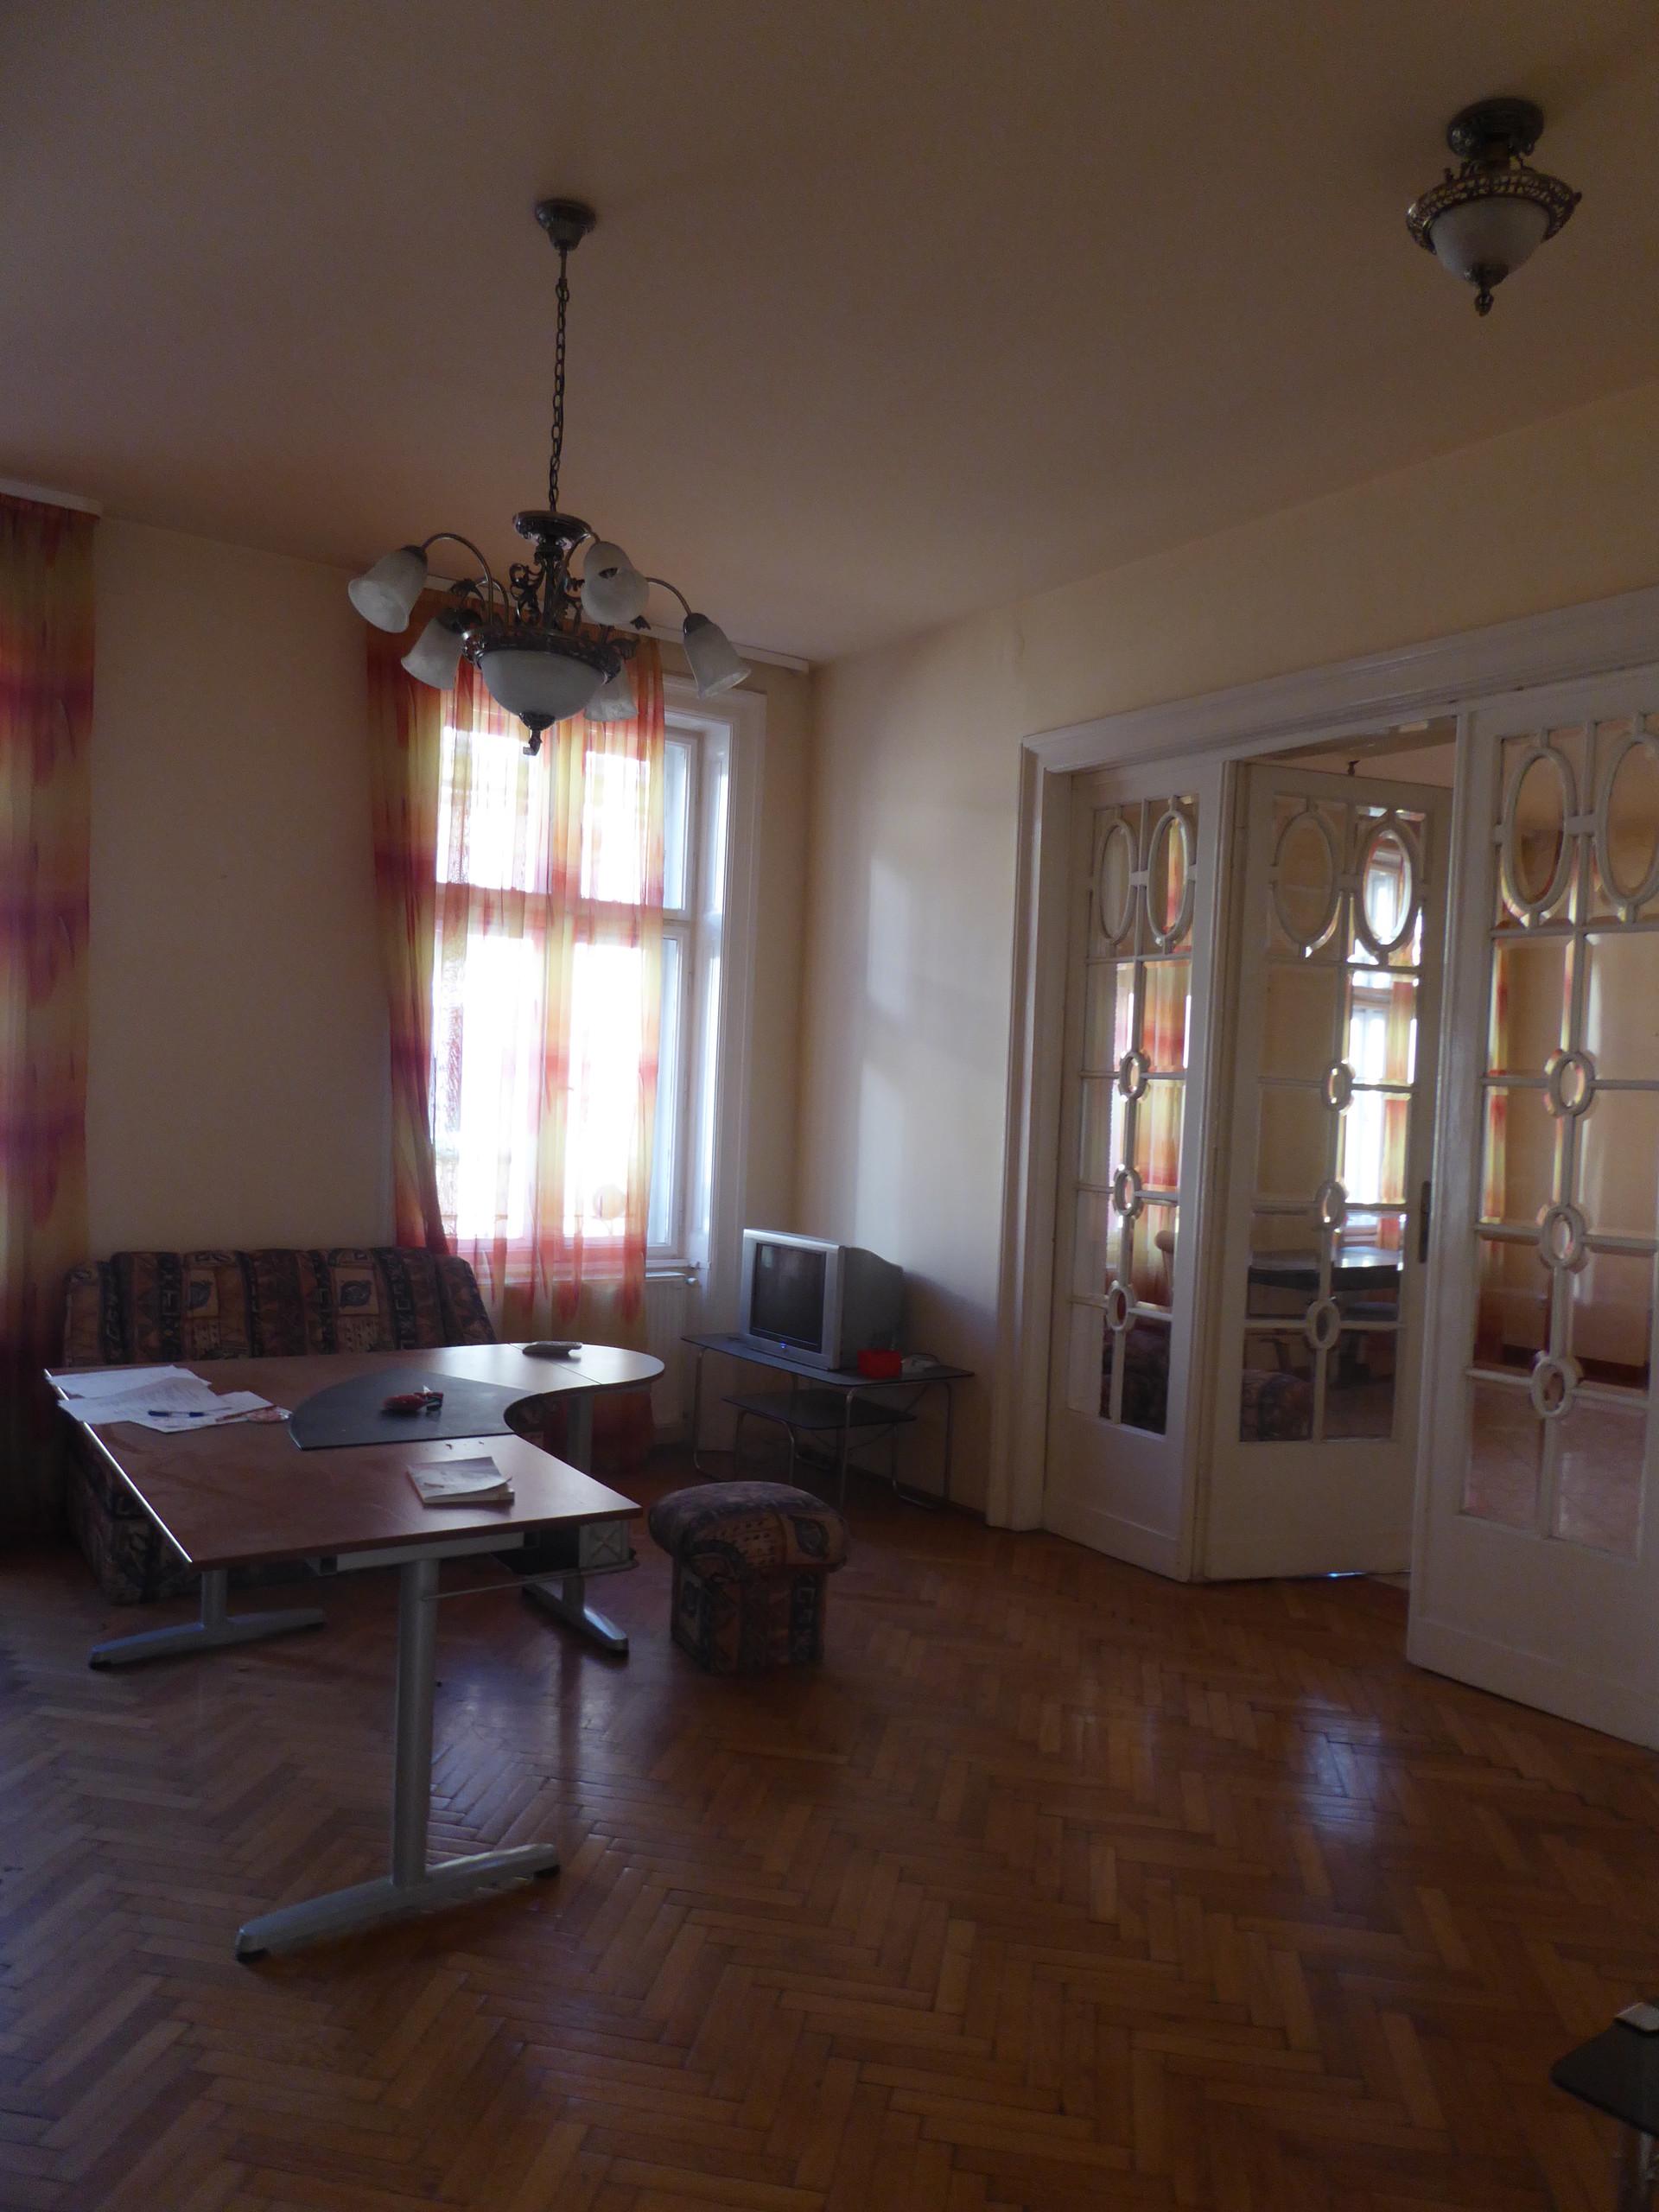 Apartment distric6 dessewffy corner Hajos utca with 3 bedrooms